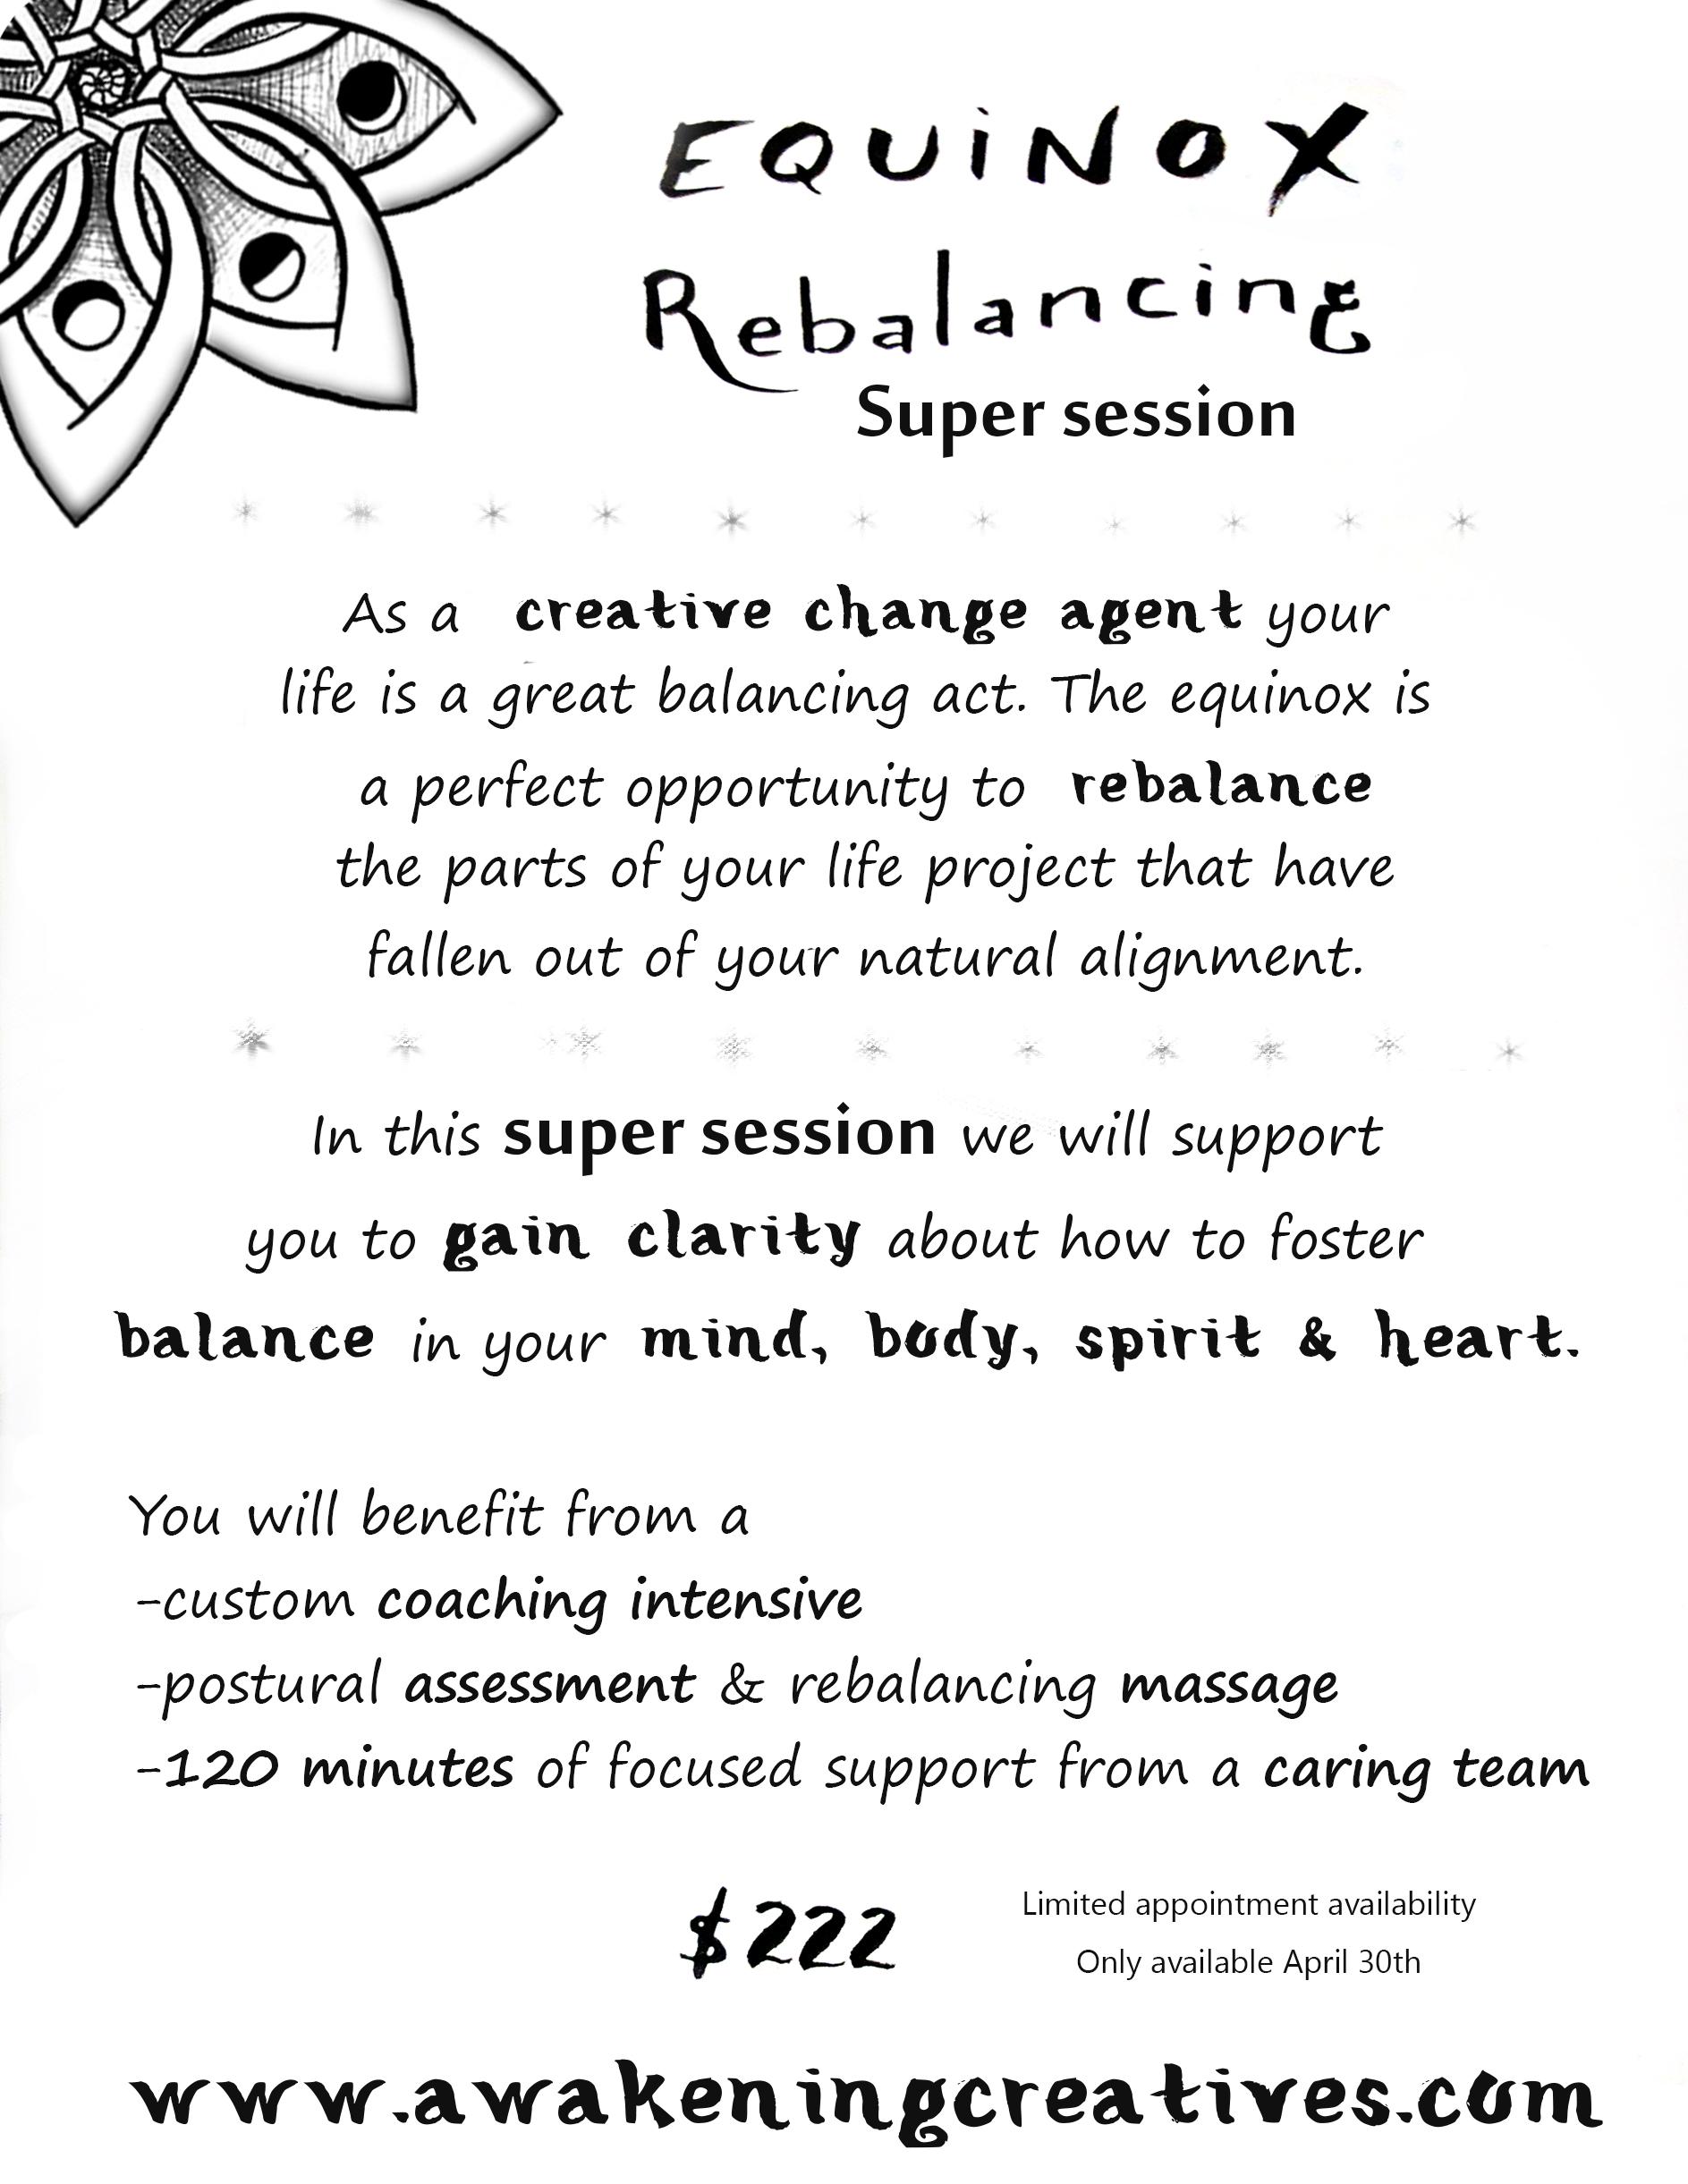 Equinox Rebalancing Flyer.jpg